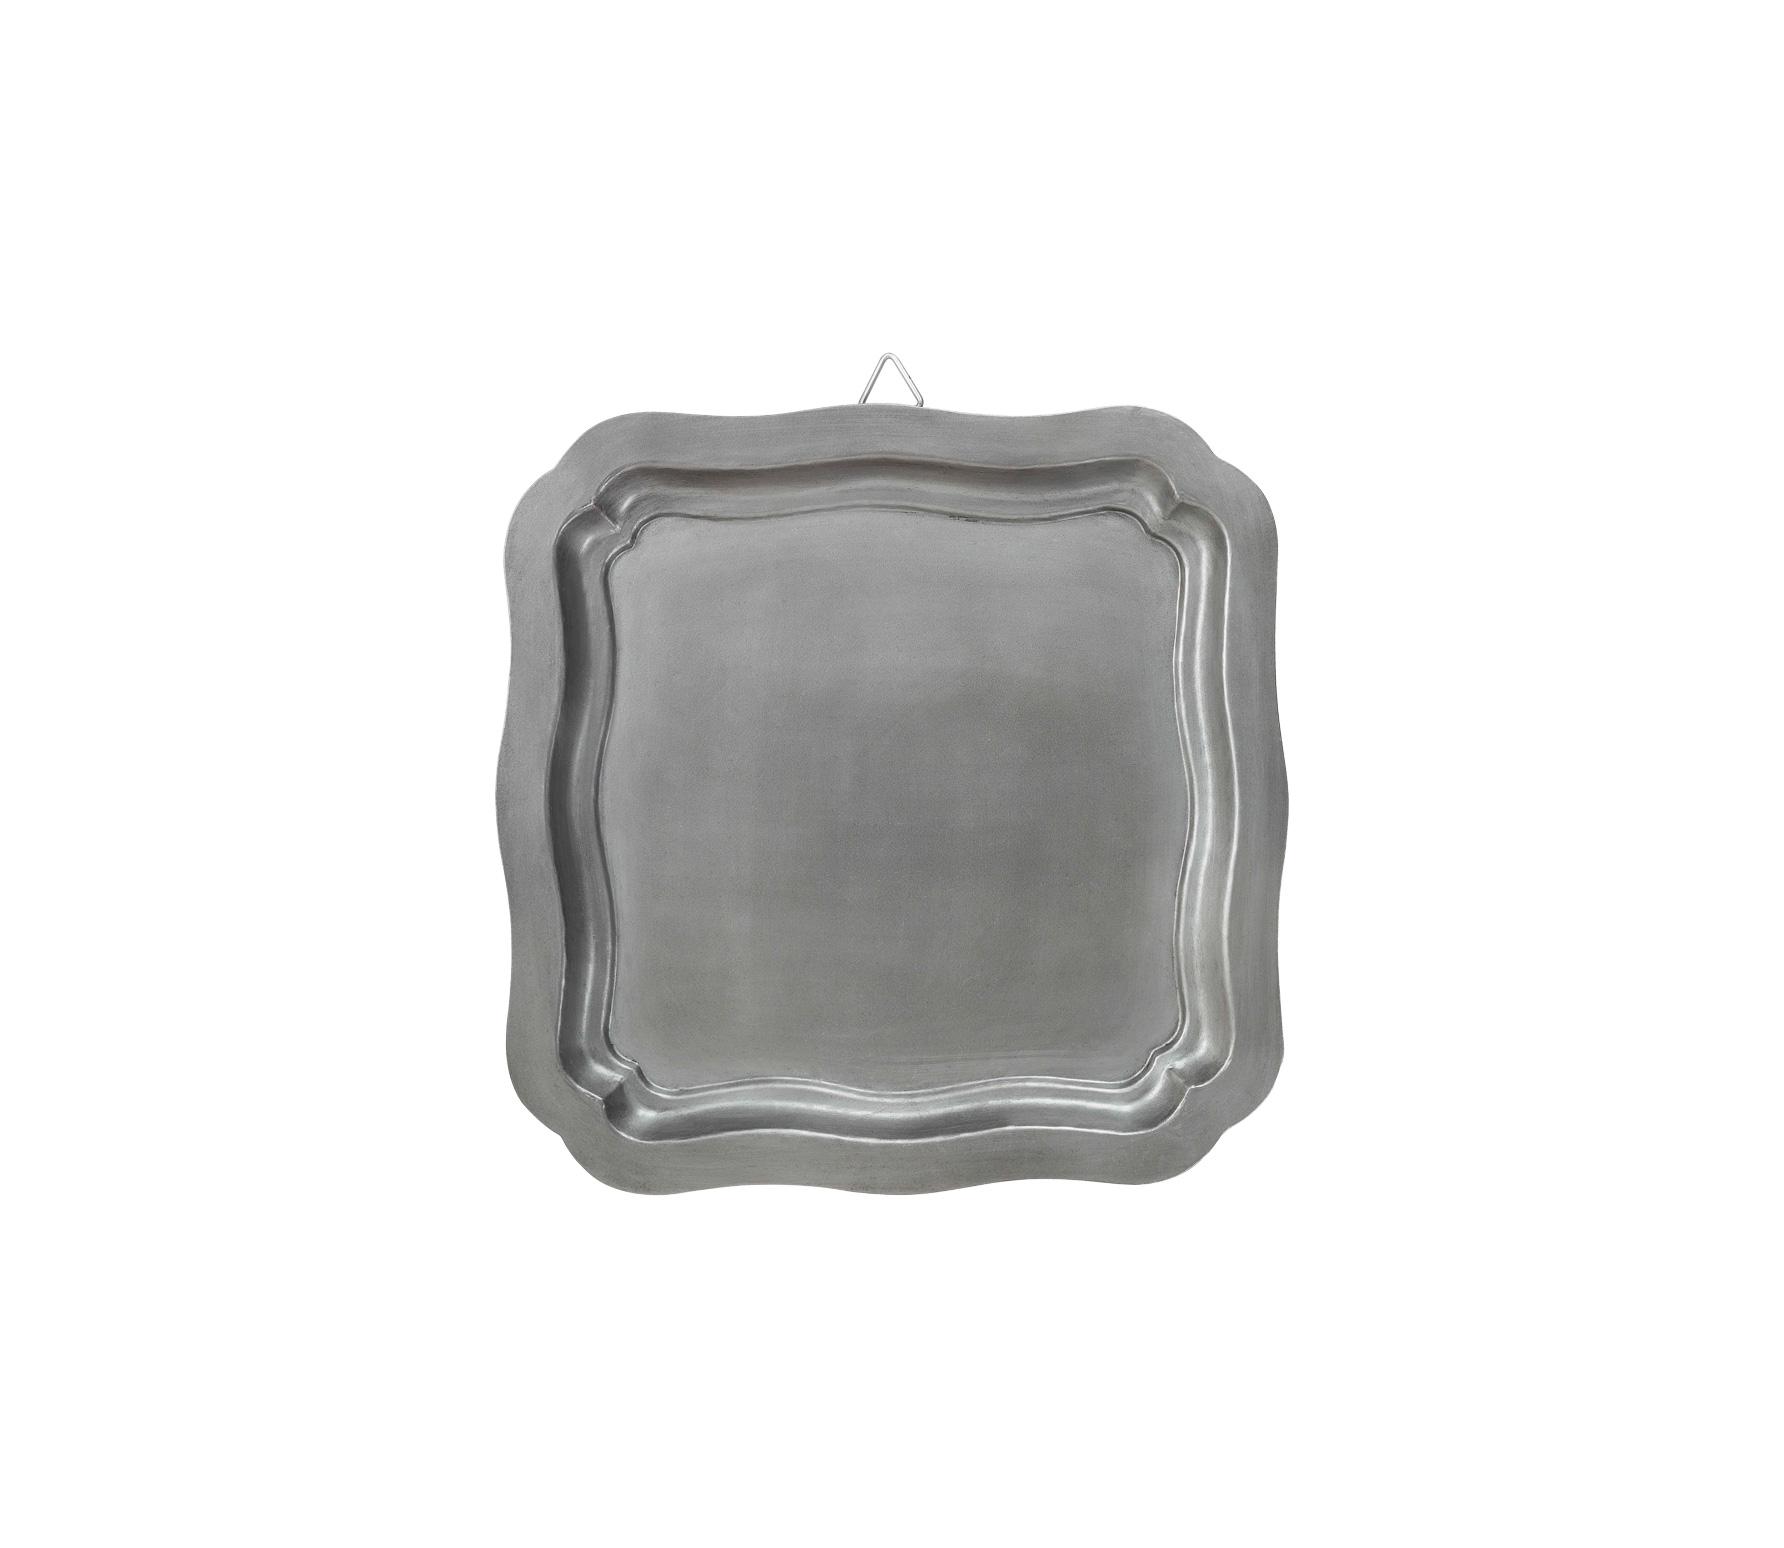 vtwonen Dienblad vierkant antique zilver finish 40x40 cm vrijstaand